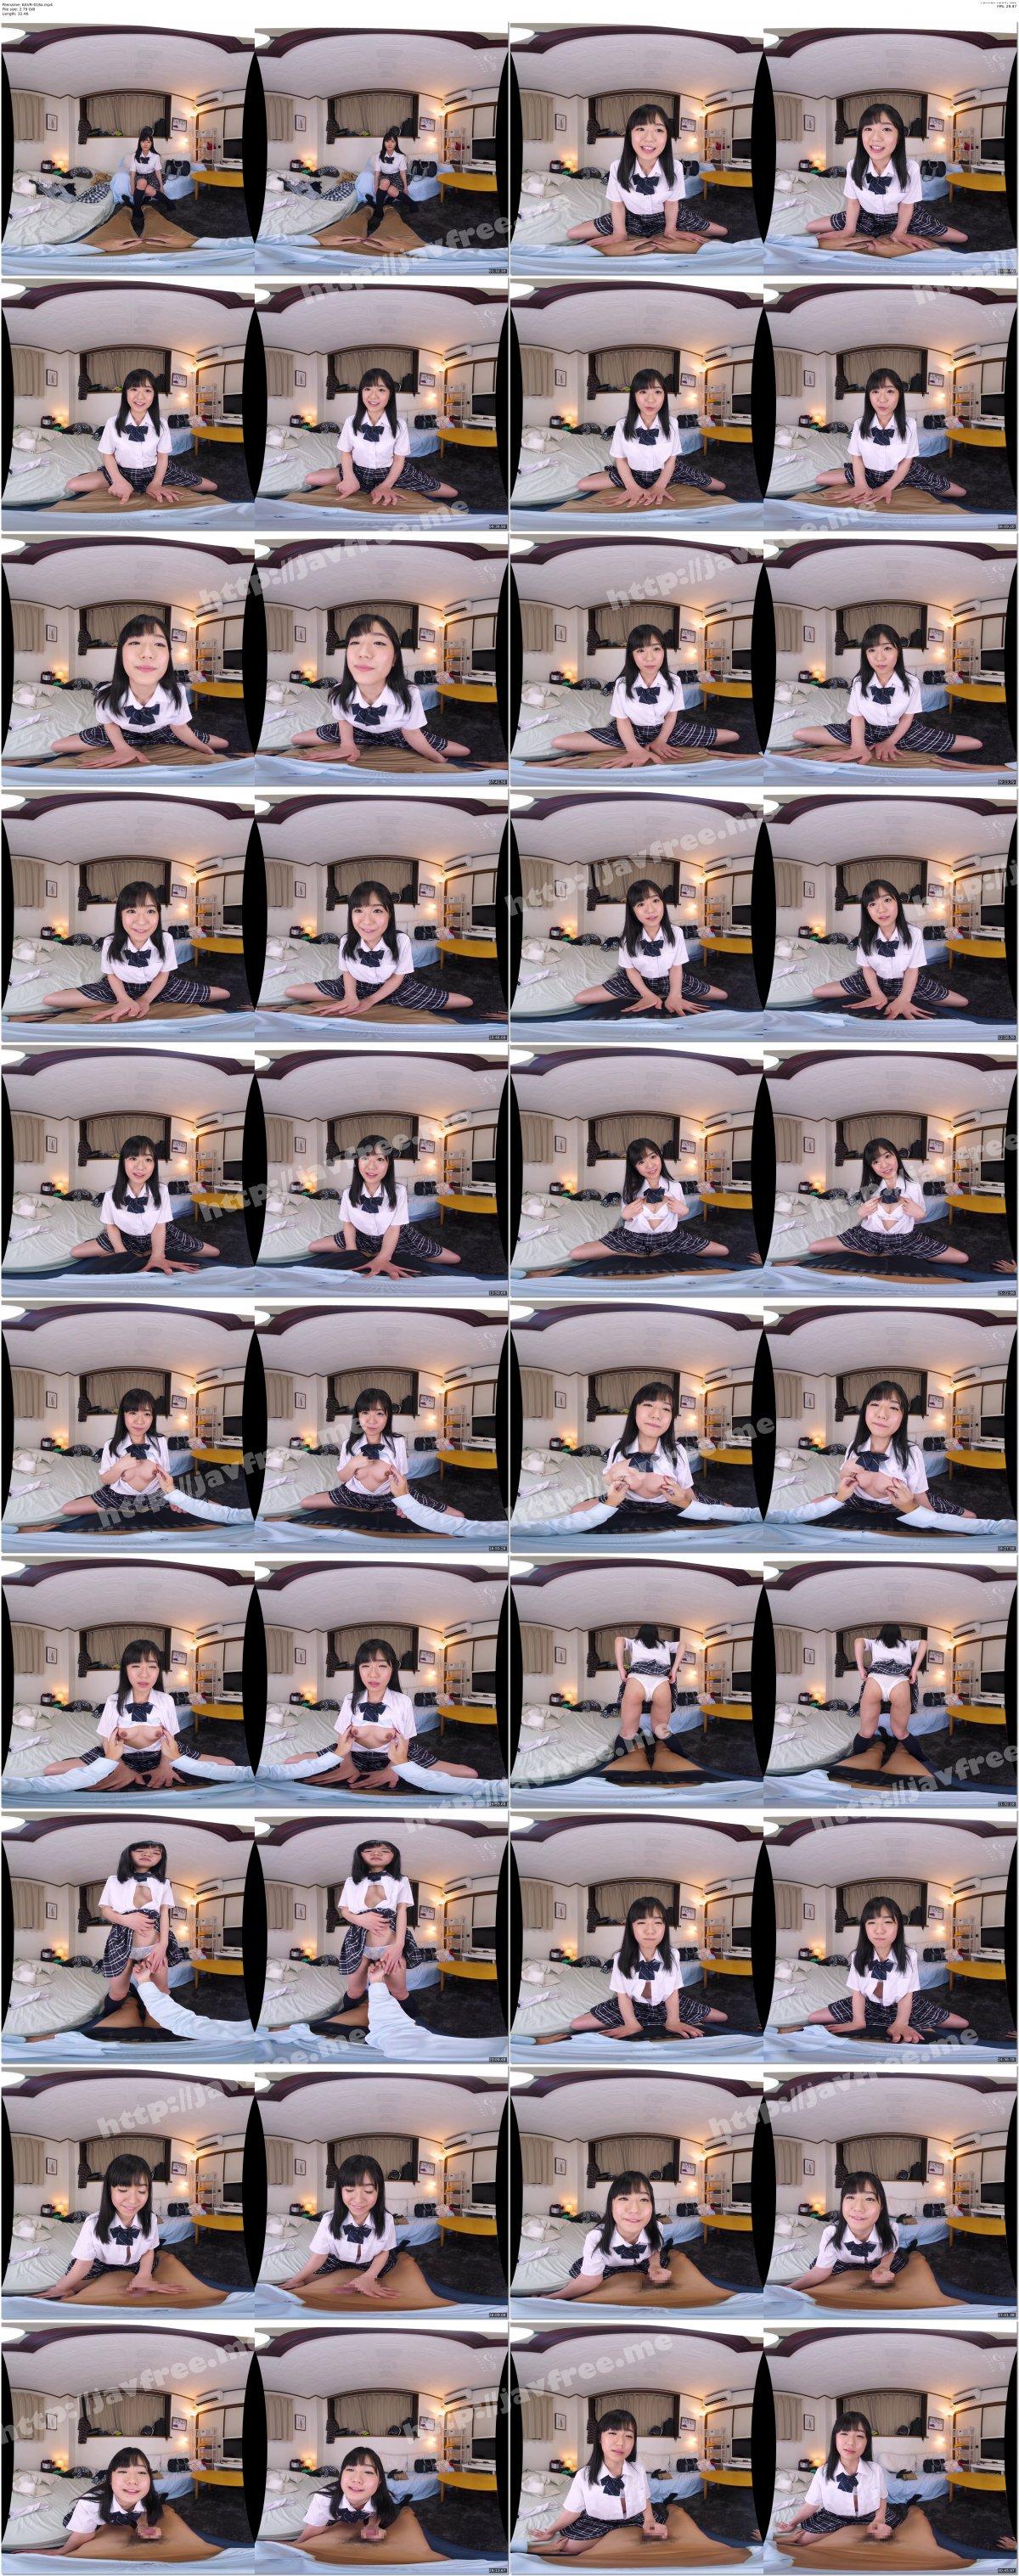 [KAVR-018] 【VR】小悪魔生徒が超大胆 挑発パンチラ誘惑 至近距離でデレデレが止まらない高密着SEX 有栖るる - image KAVR-018a on https://javfree.me